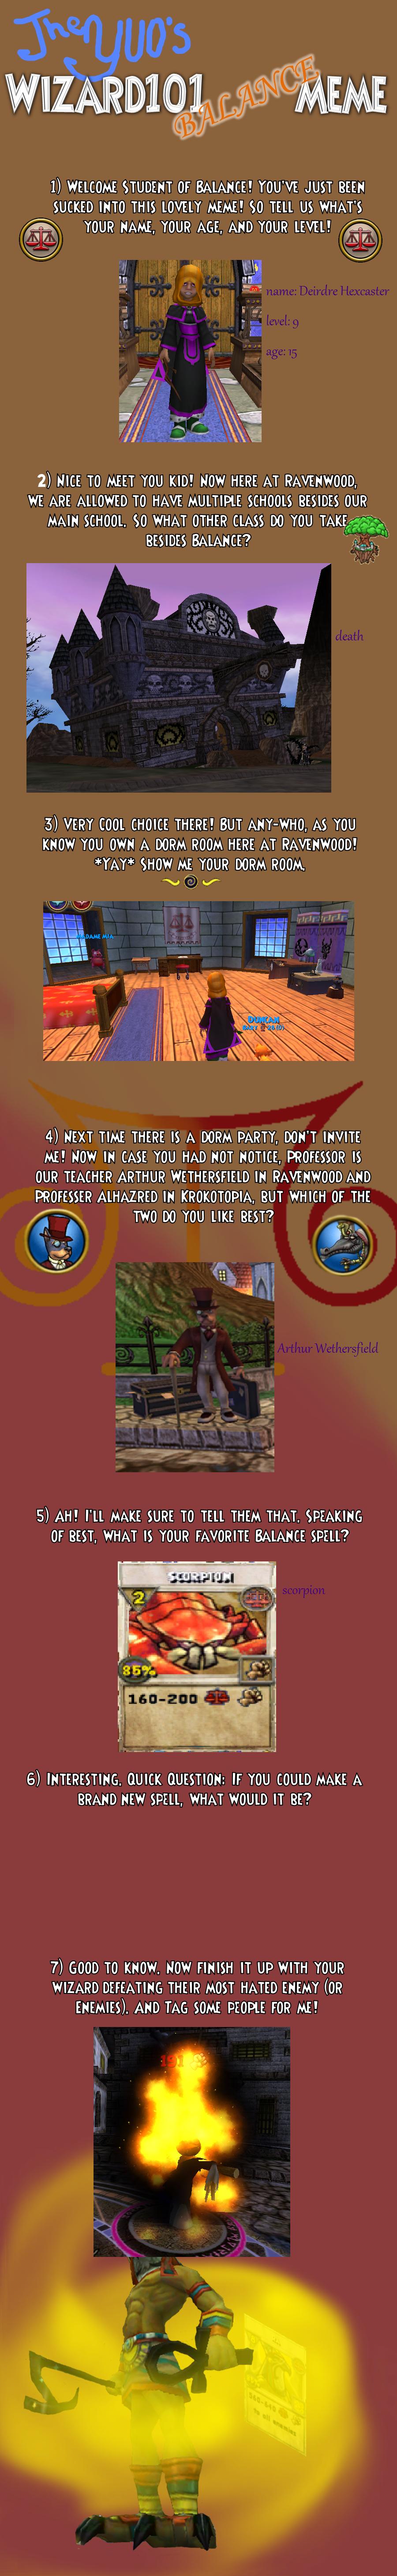 Wizard101 balance meme